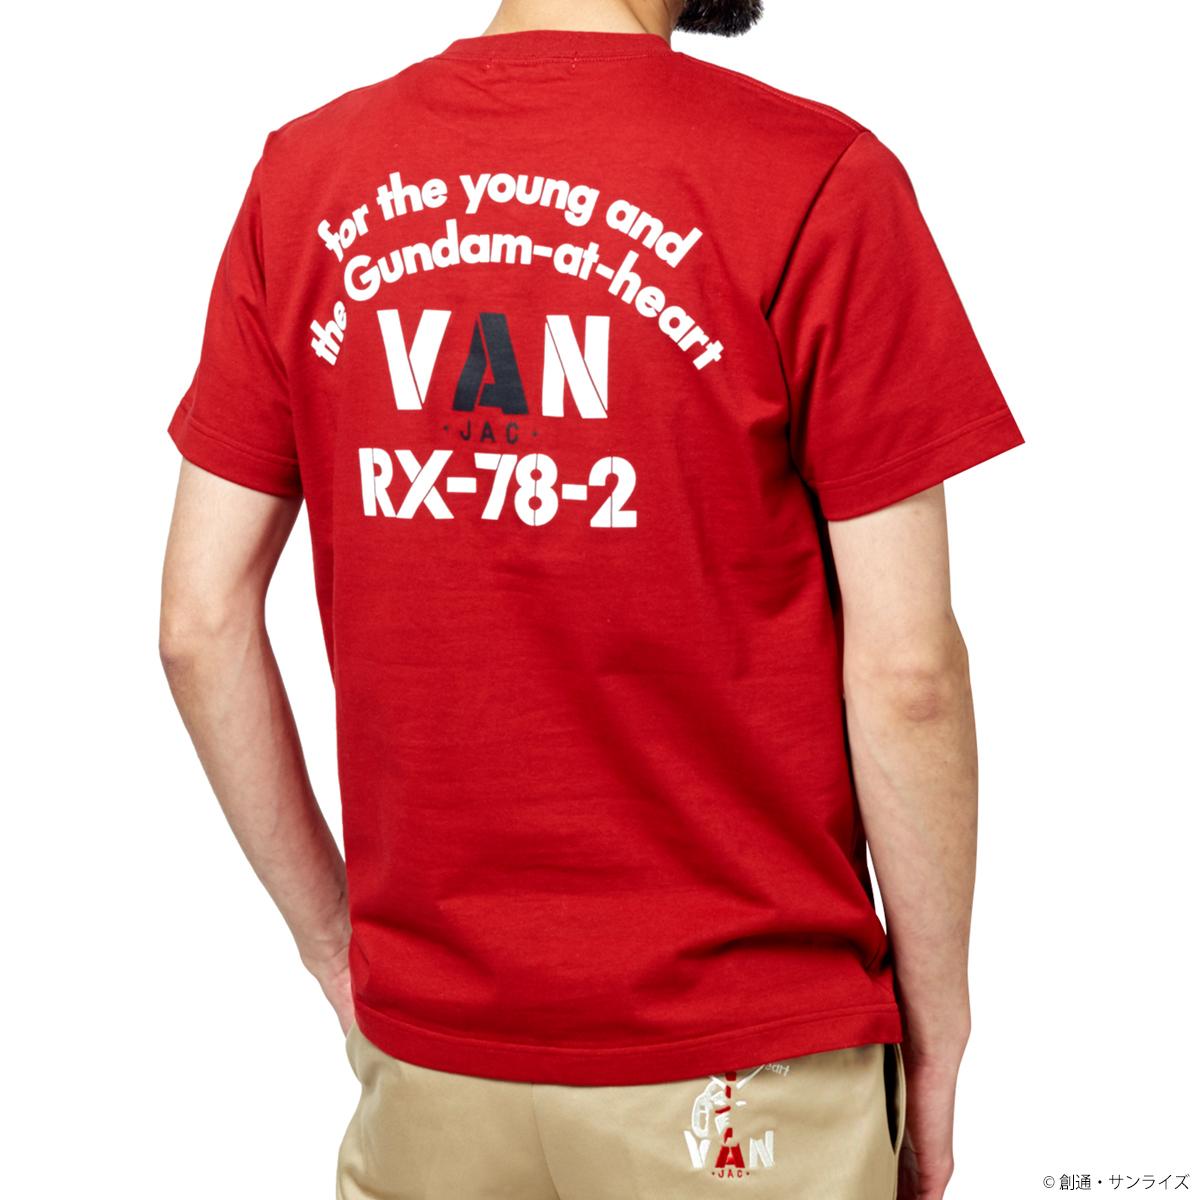 STRICT-G × VAN『機動戦士ガンダム』Tシャツ